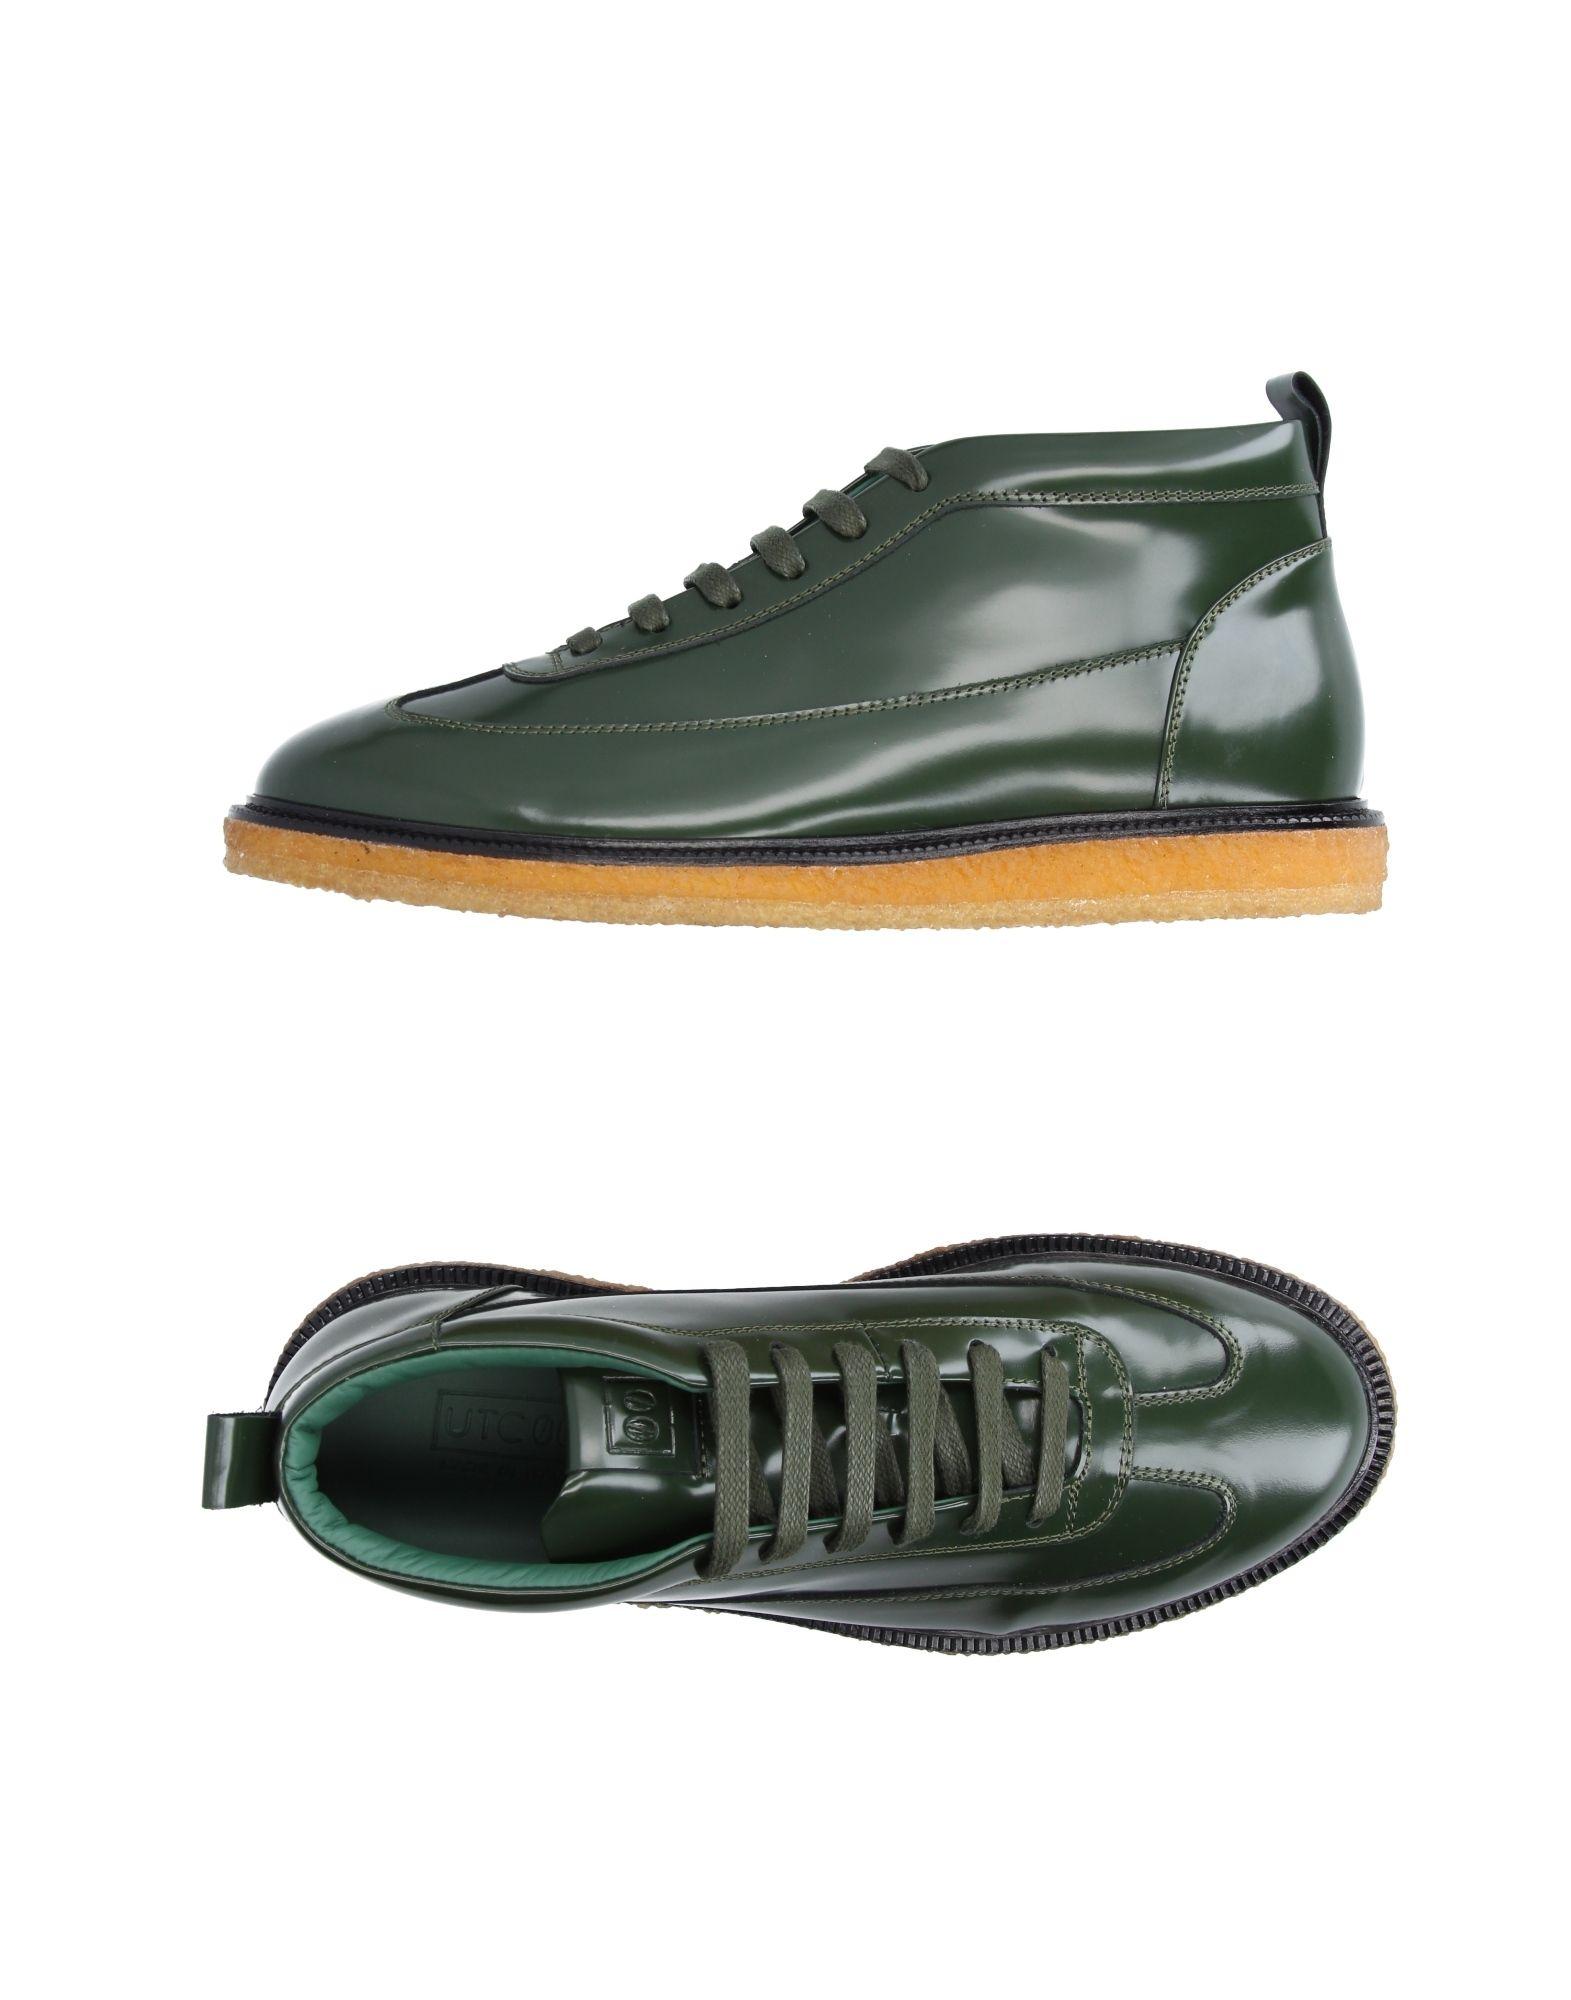 11219740AS Utc00 Sneakers Herren  11219740AS  Heiße Schuhe a98a2c